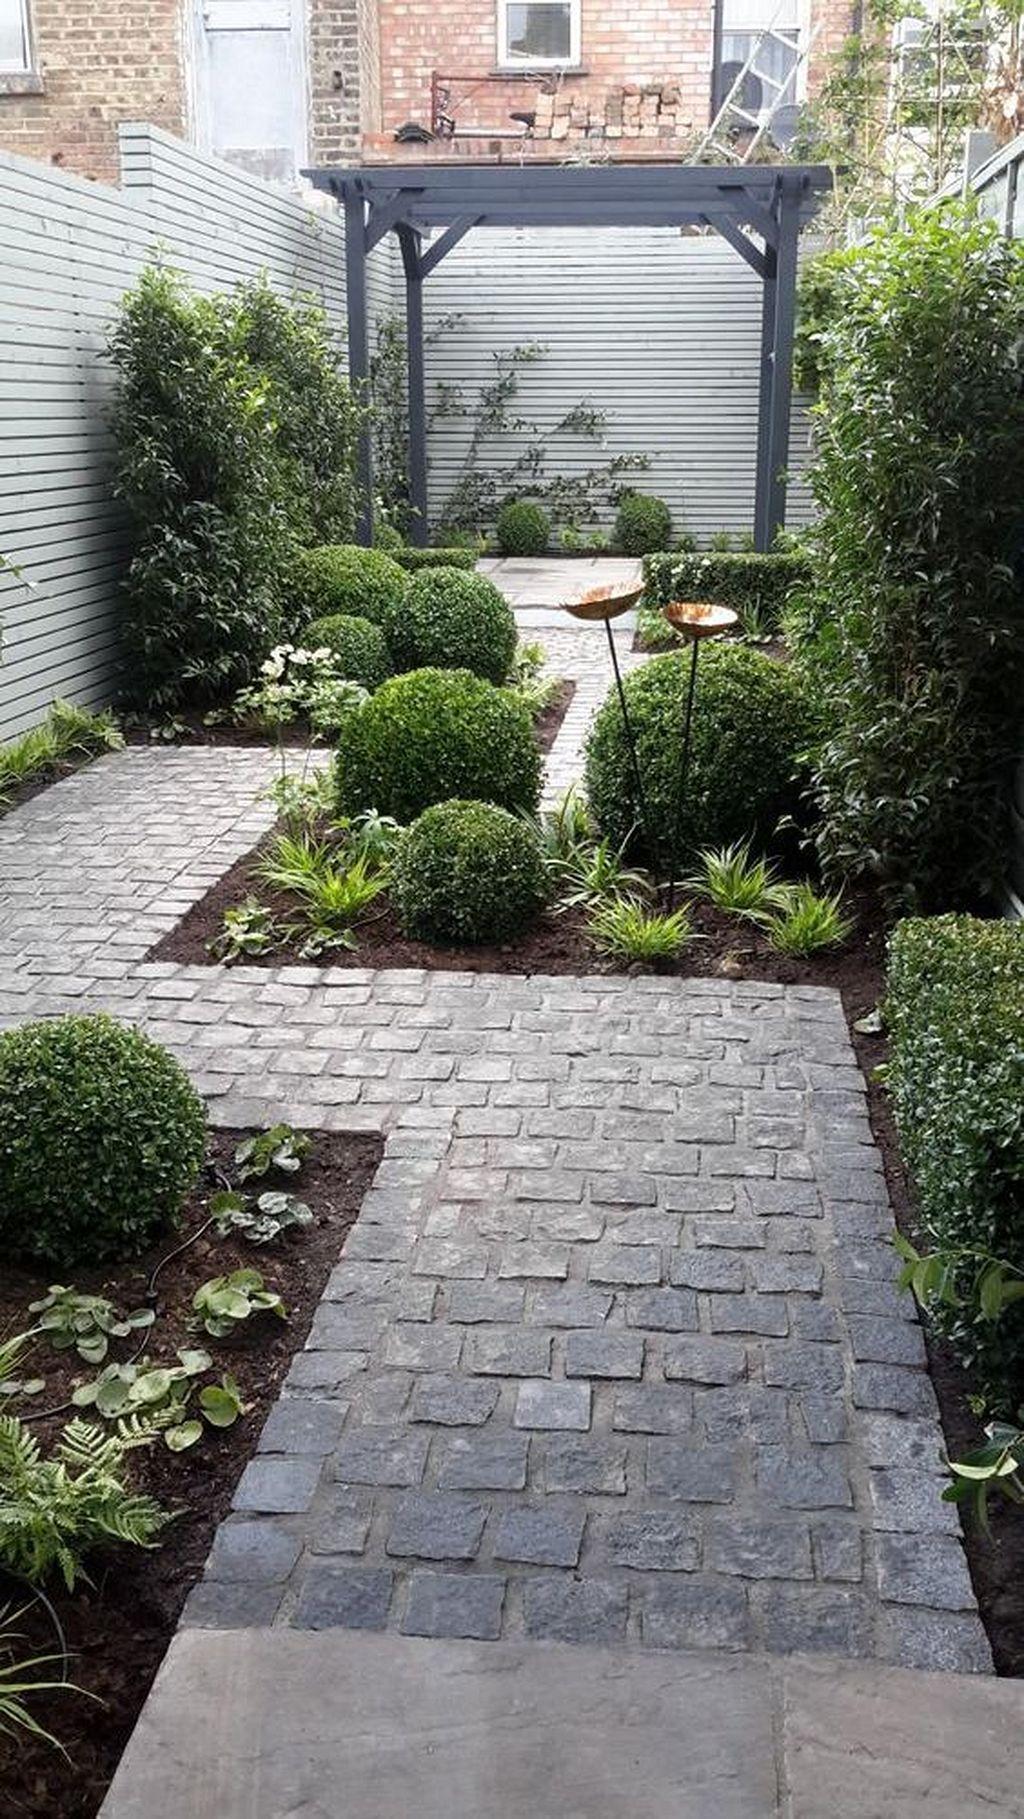 Small Backyard Landscaping Ideas 40 Taman Indah Kebun Eksterior Backyard landscaping ideas for a small yard